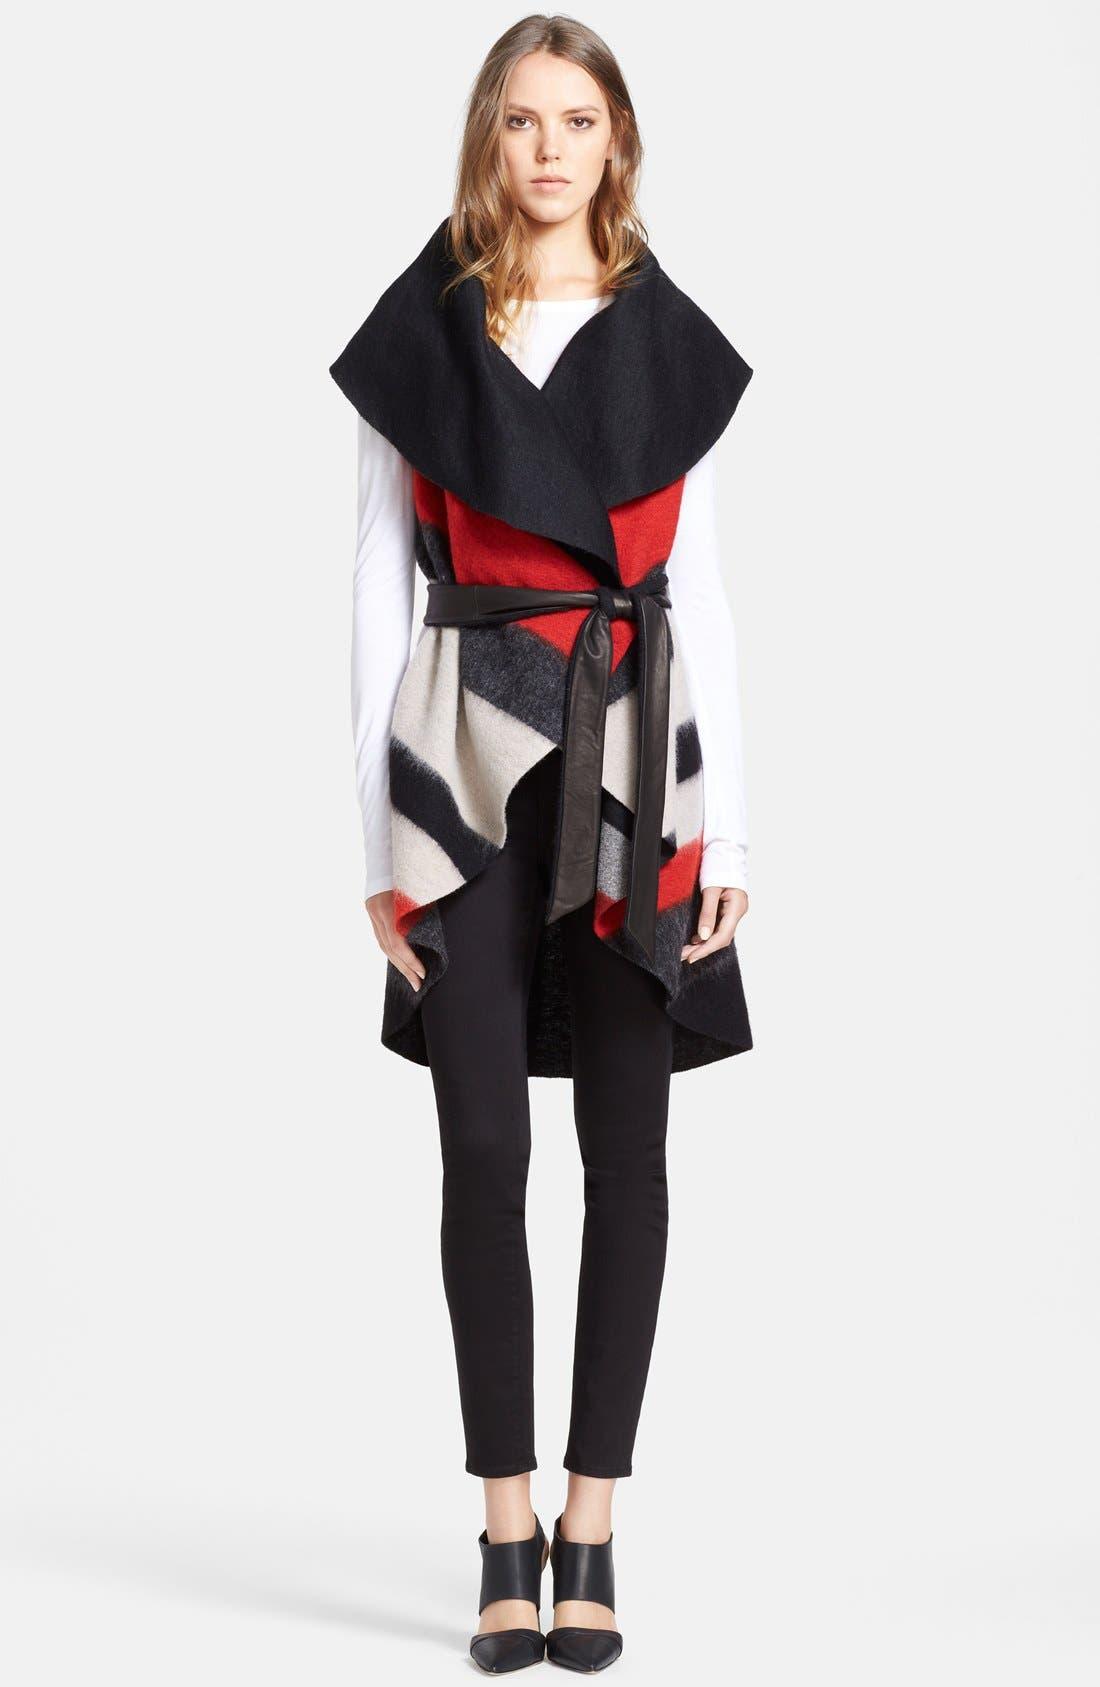 Alternate Image 1 Selected - Alice + Olivia 'Keira' Sleeveless Wool Blend Wrap with Leather Belt